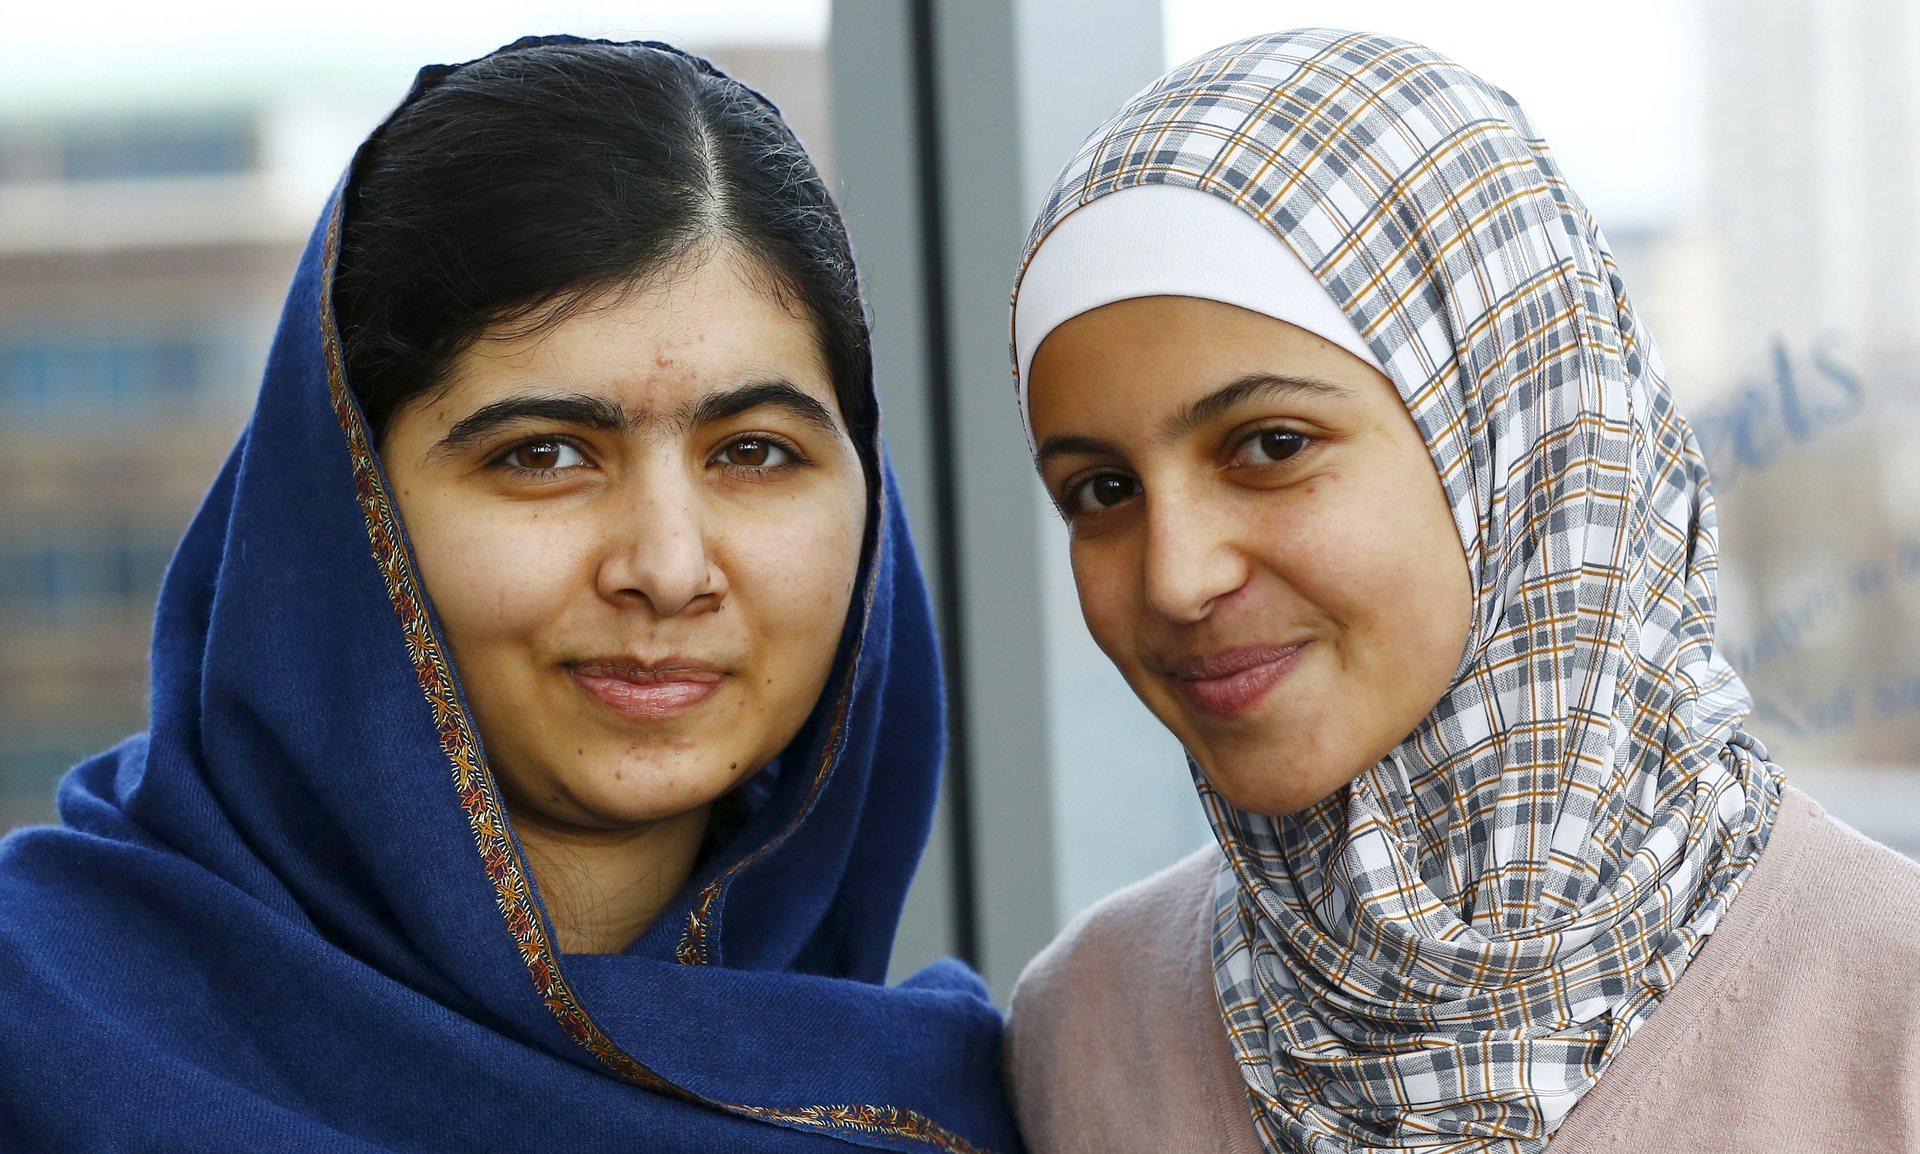 Girls' education advocates Malala Yousafzai, left, and Muzoon Almellehan, right. Photo credit:   Darren Staples/Reuters